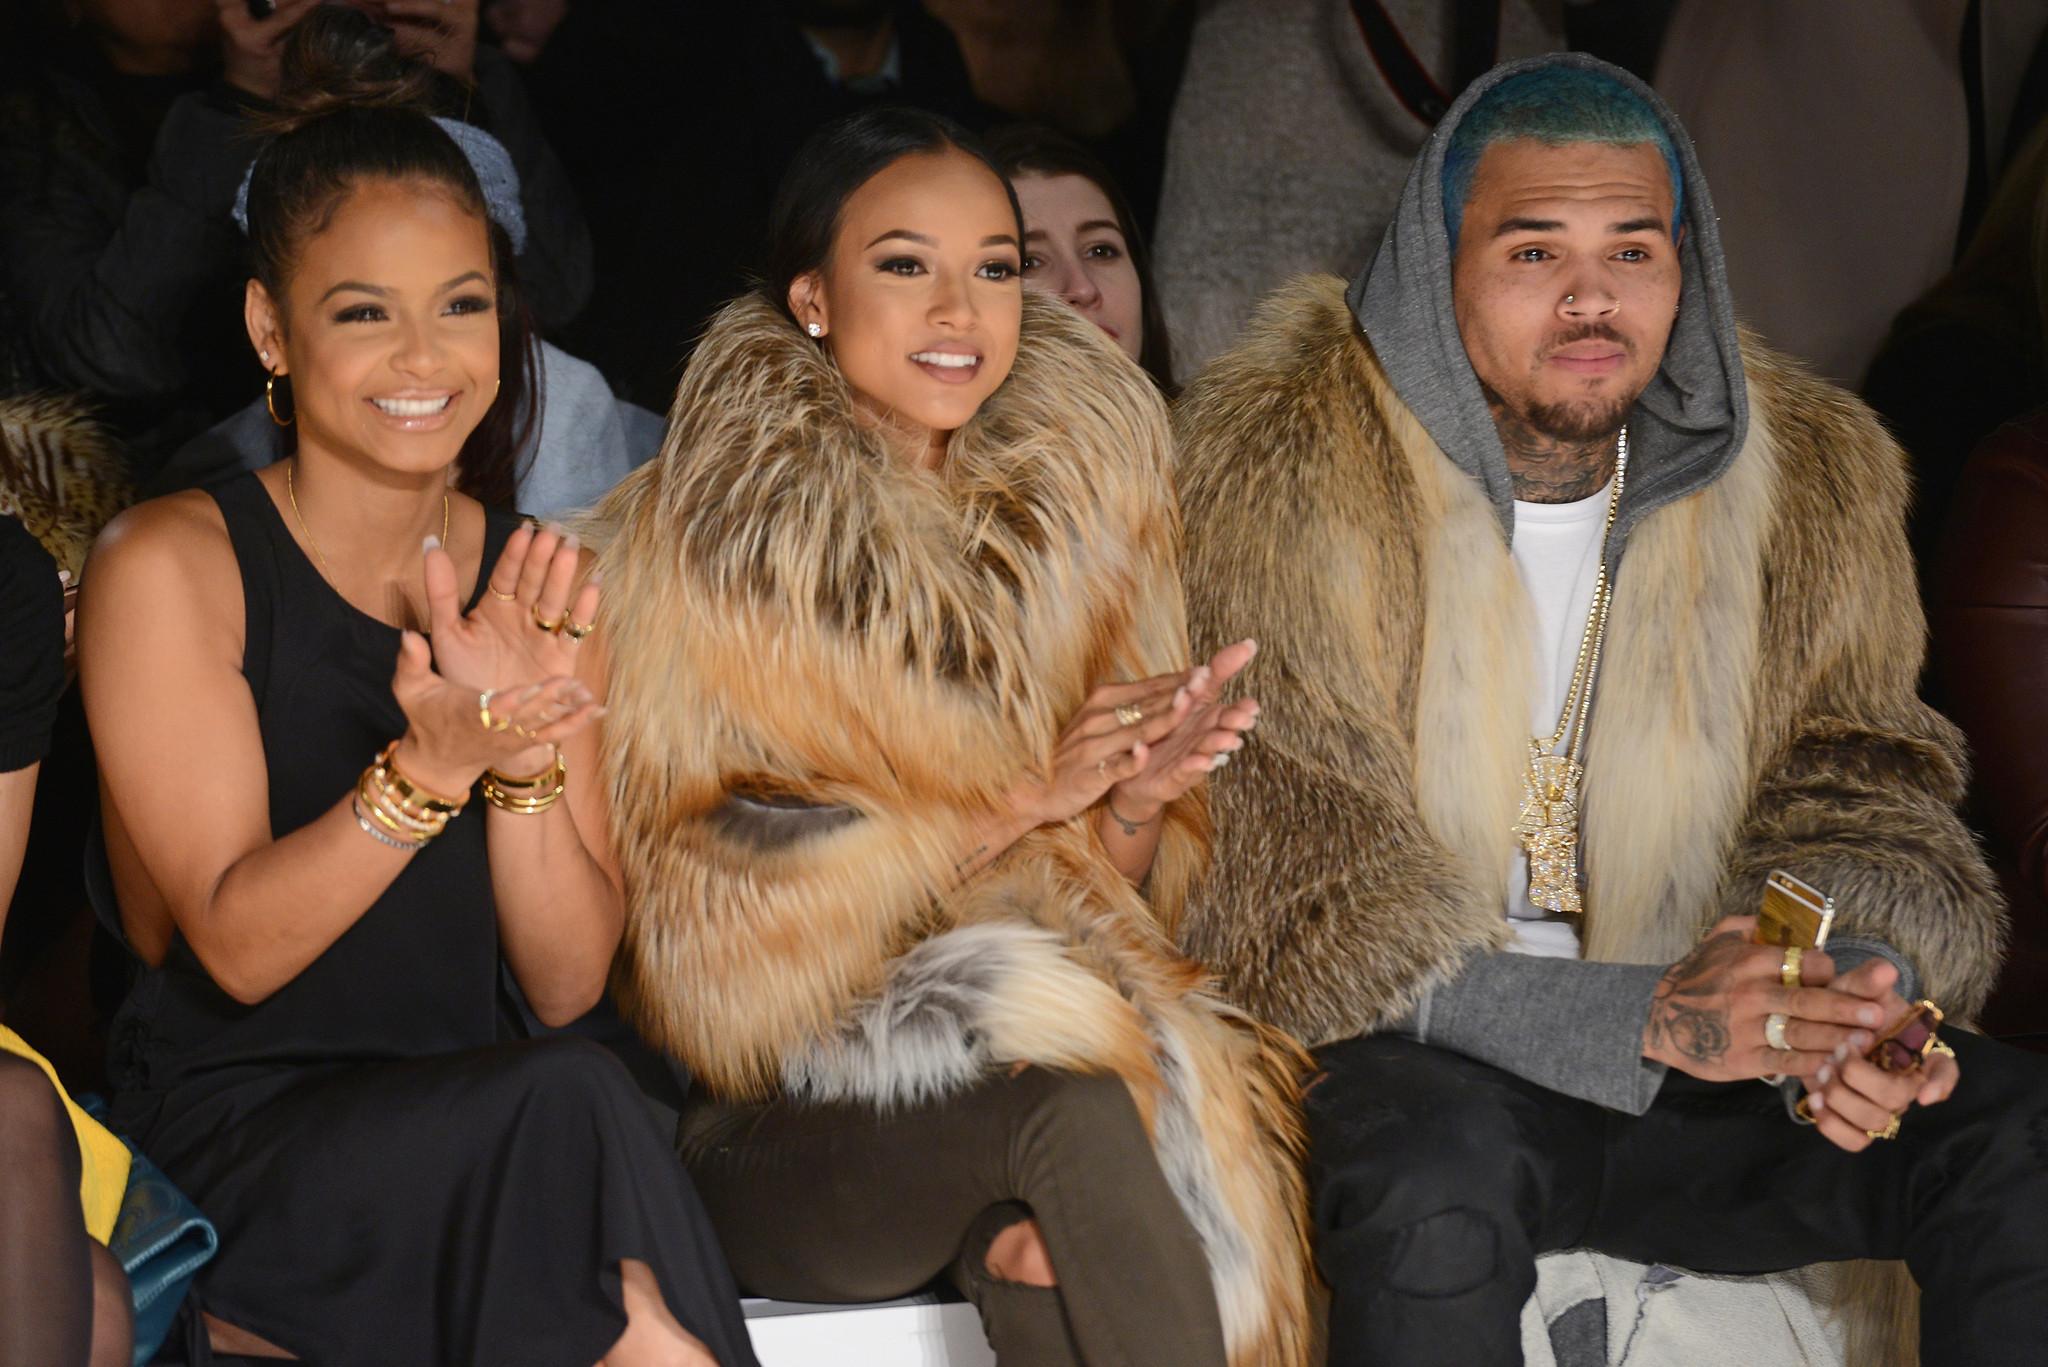 Chris Brown urges Karrueche Tran to keep it classy ...